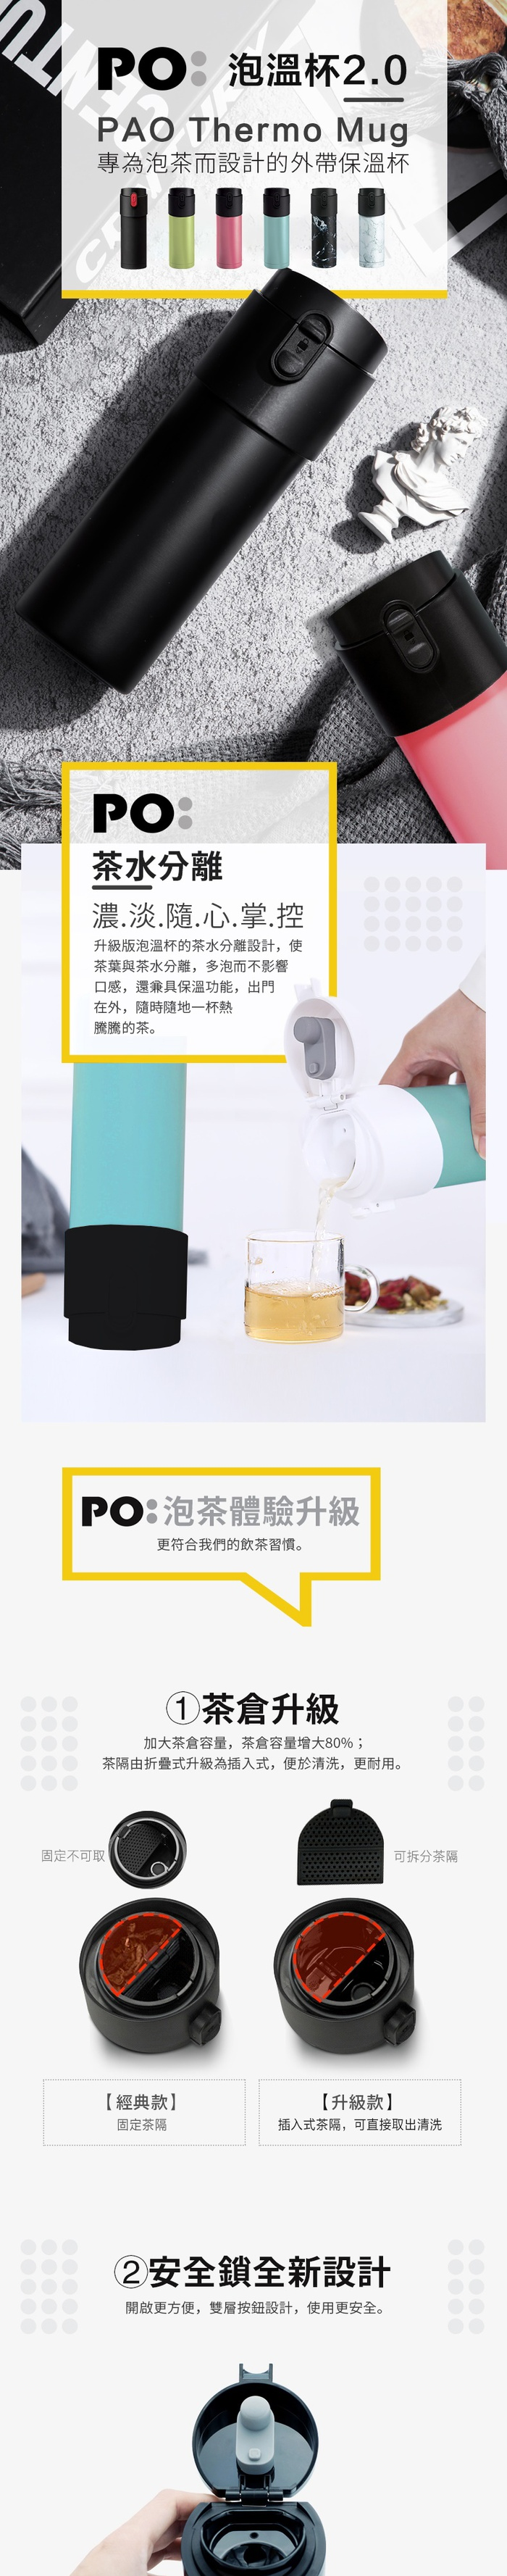 PO:Selected 丹麥掀蓋12oz保溫泡茶杯(黑)